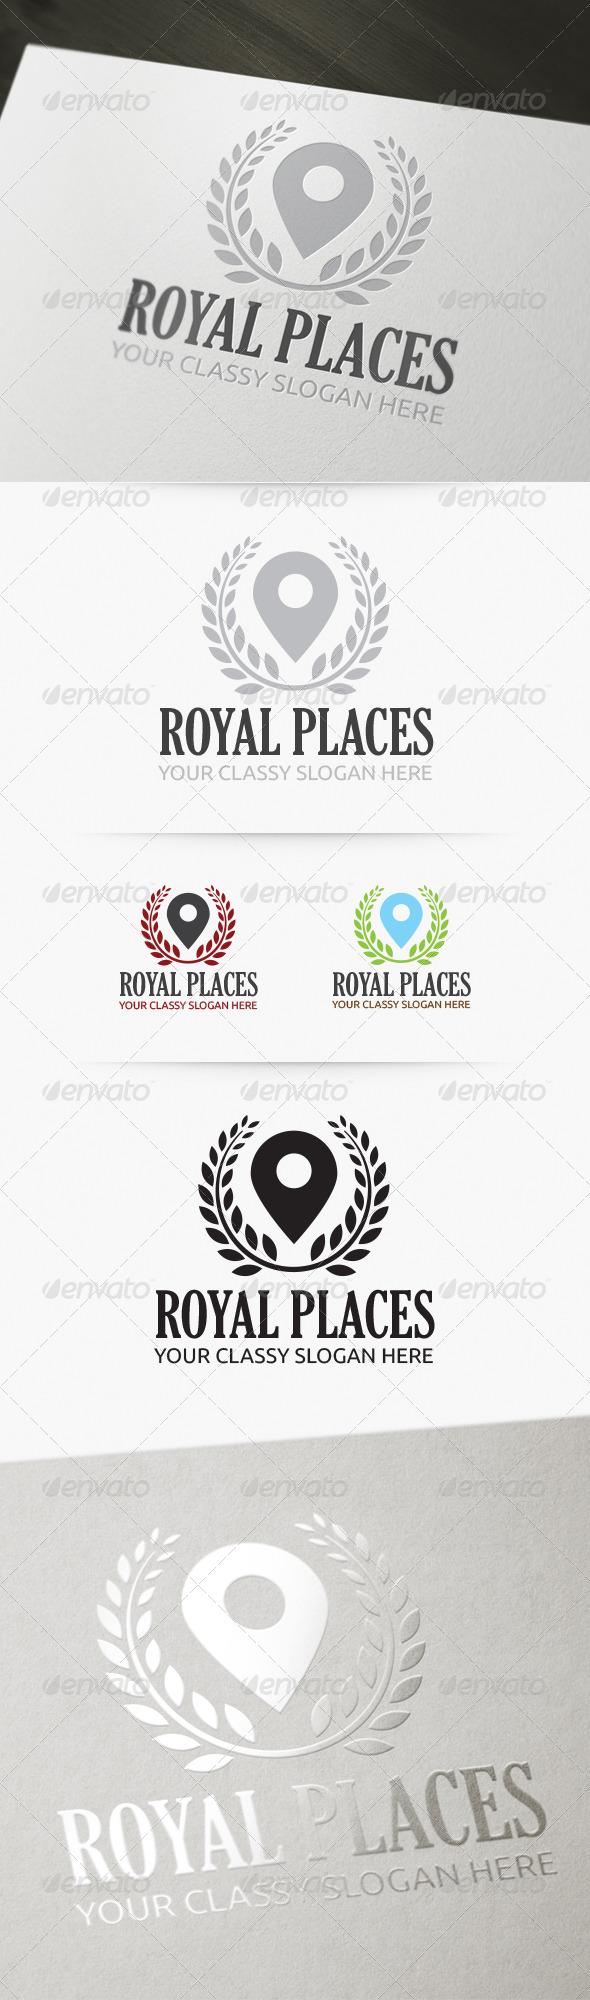 GraphicRiver Royal Places Logo 4176410